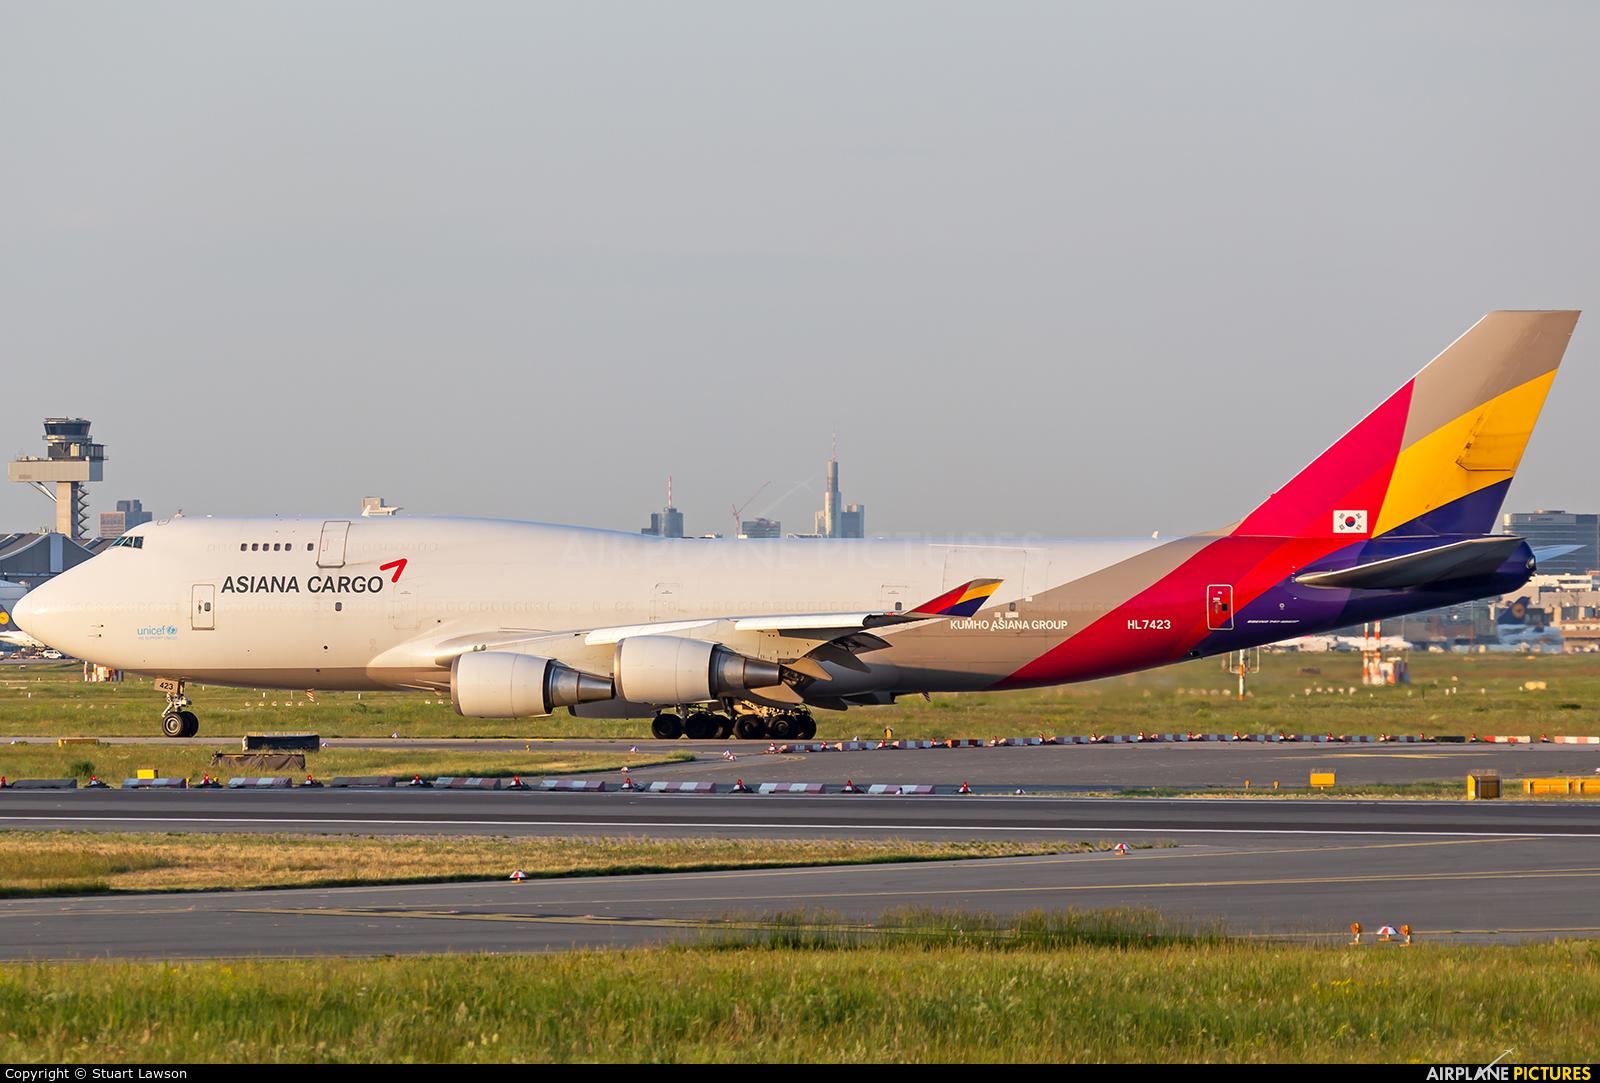 Asiana Cargo HL7423 aircraft at Frankfurt